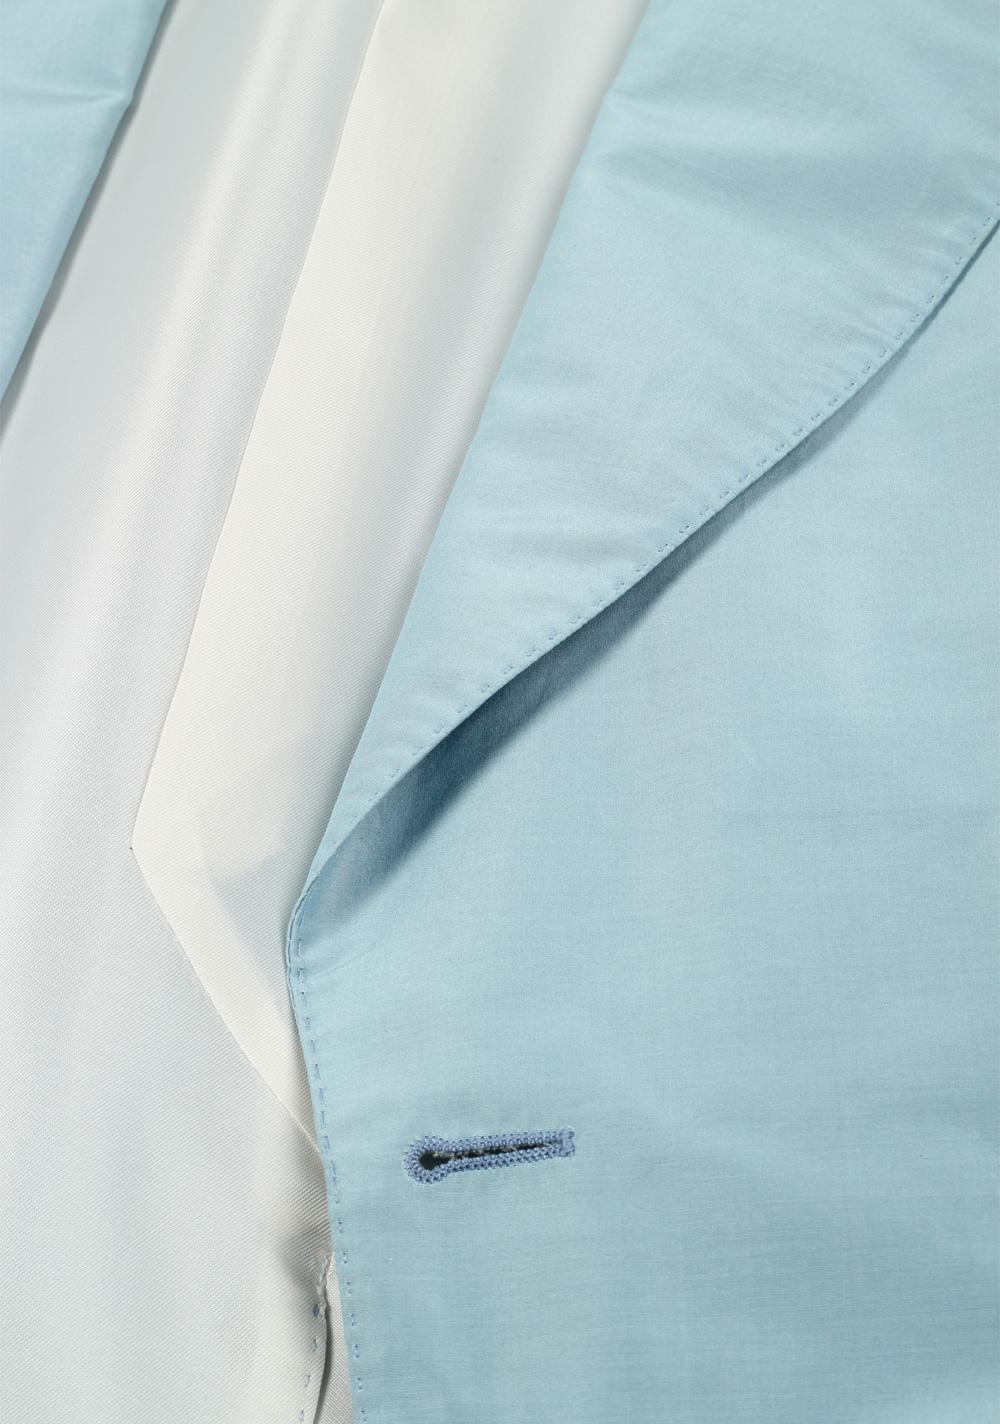 TOM FORD Buckley Blue Suit Size 46 / 36R U.S. Base V | Costume Limité